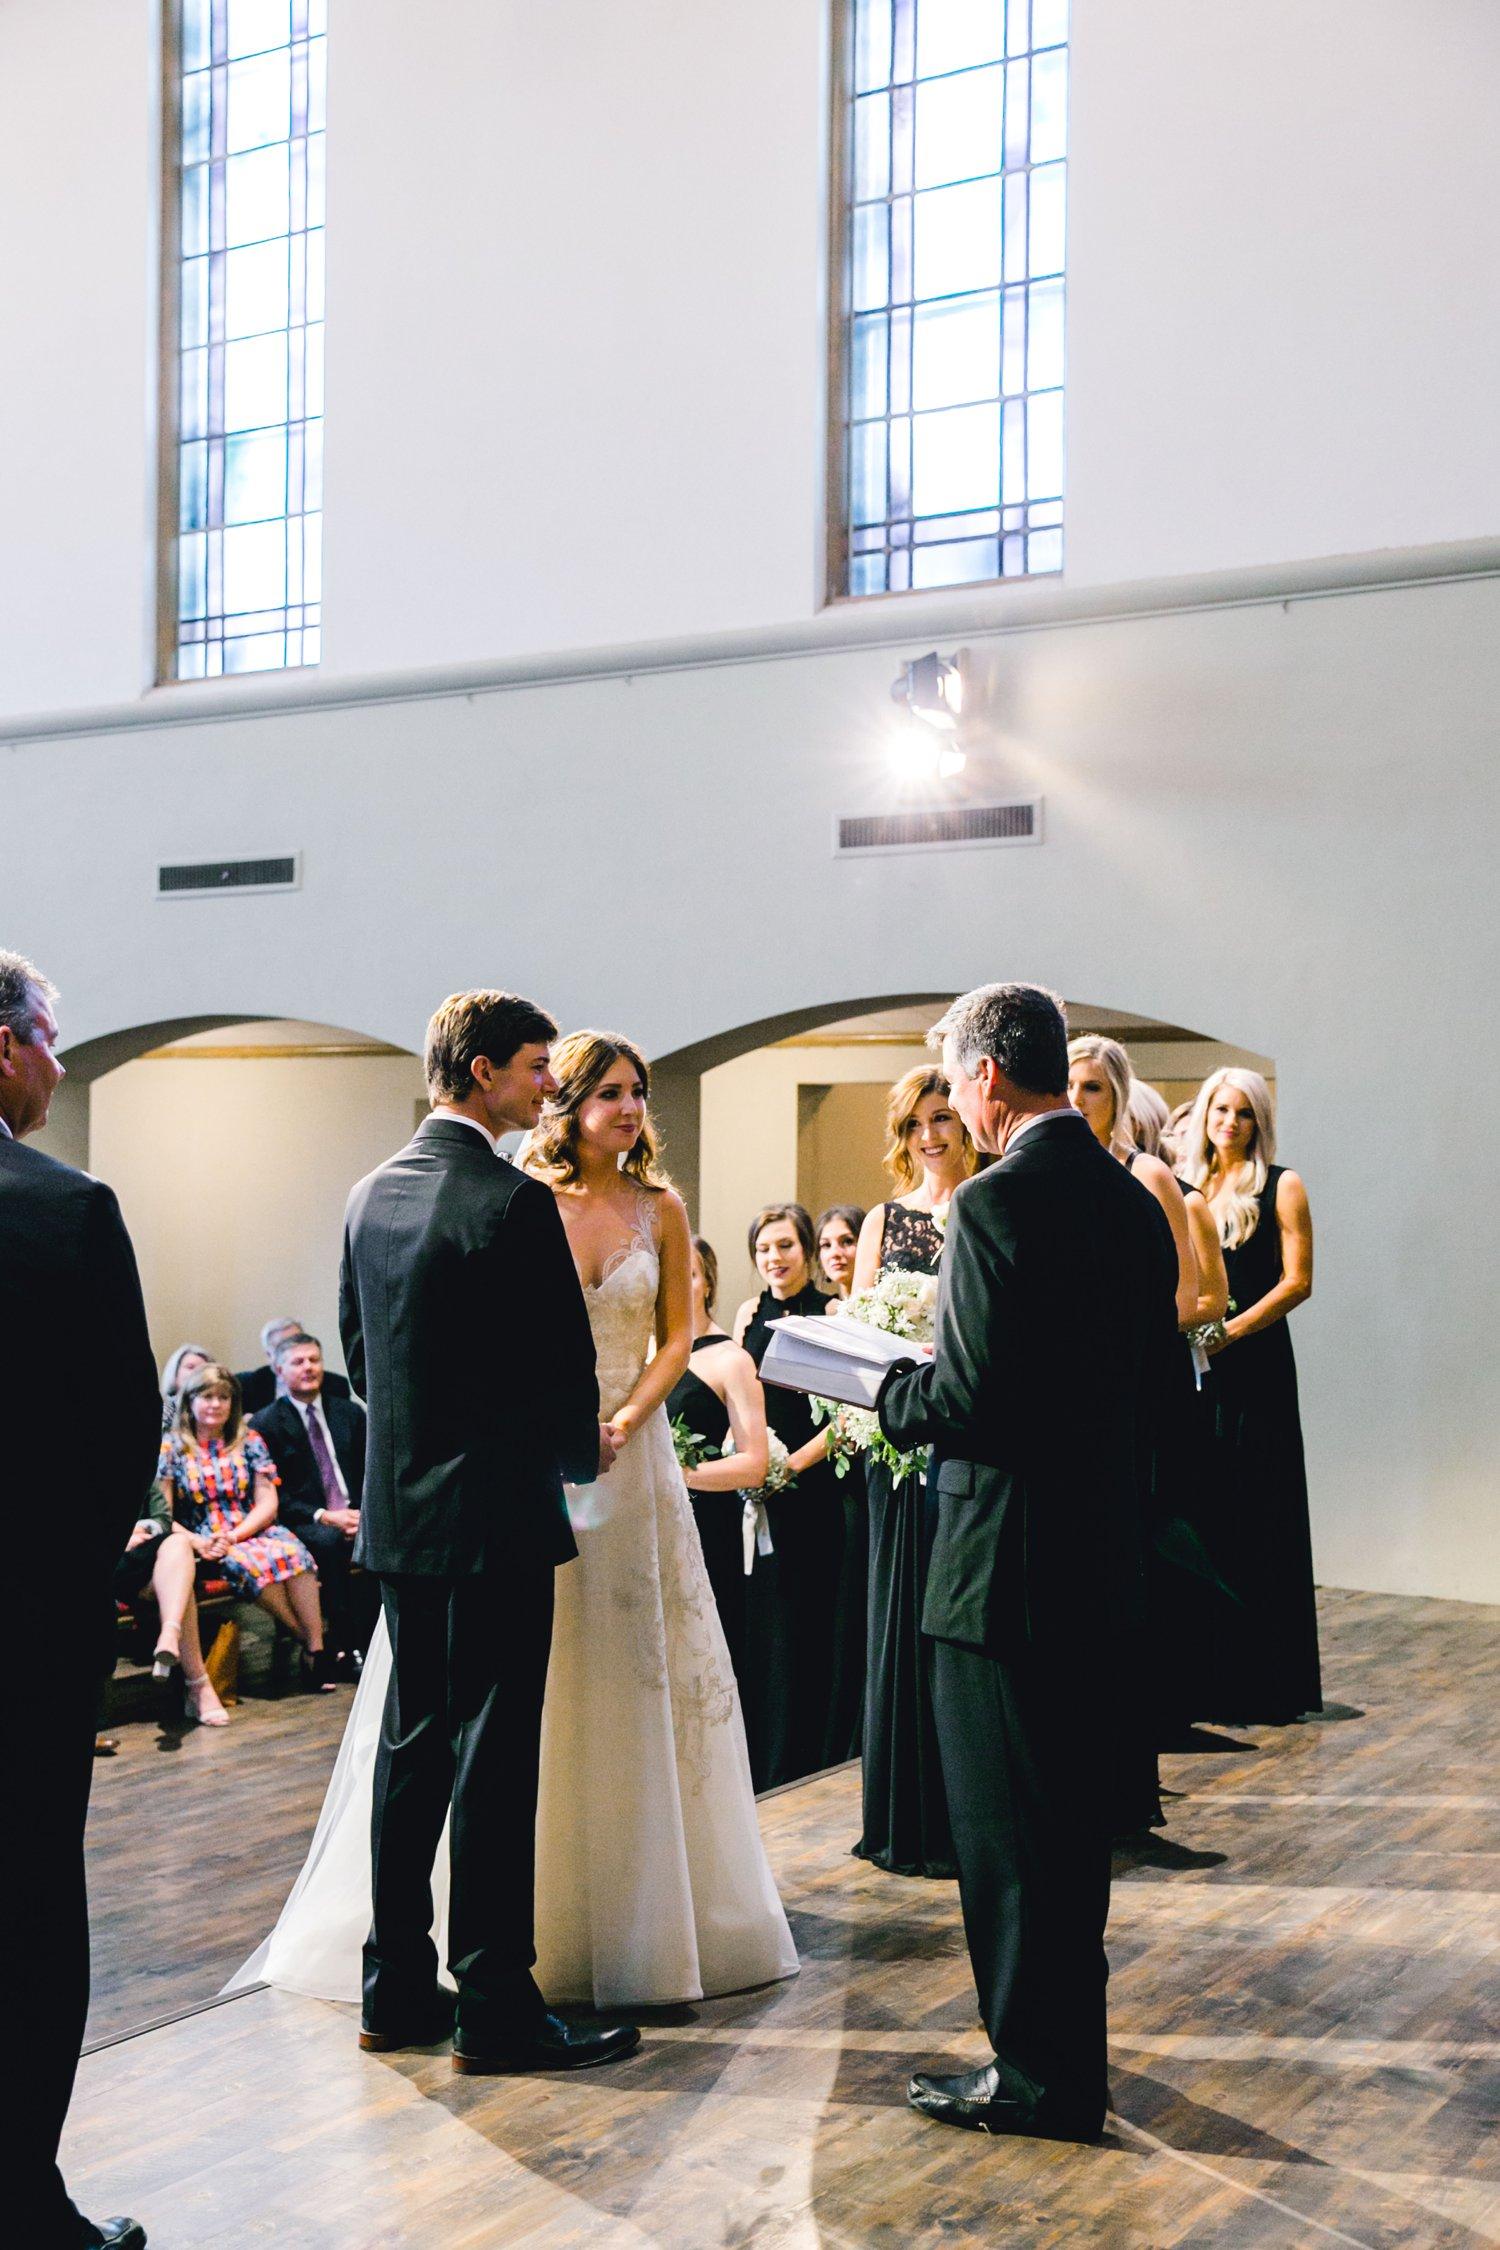 Hunter_and_Molly_Rawls_ALLEEJ_Lubbock_WEDDING_Legacy_Event_Center_0094.jpg